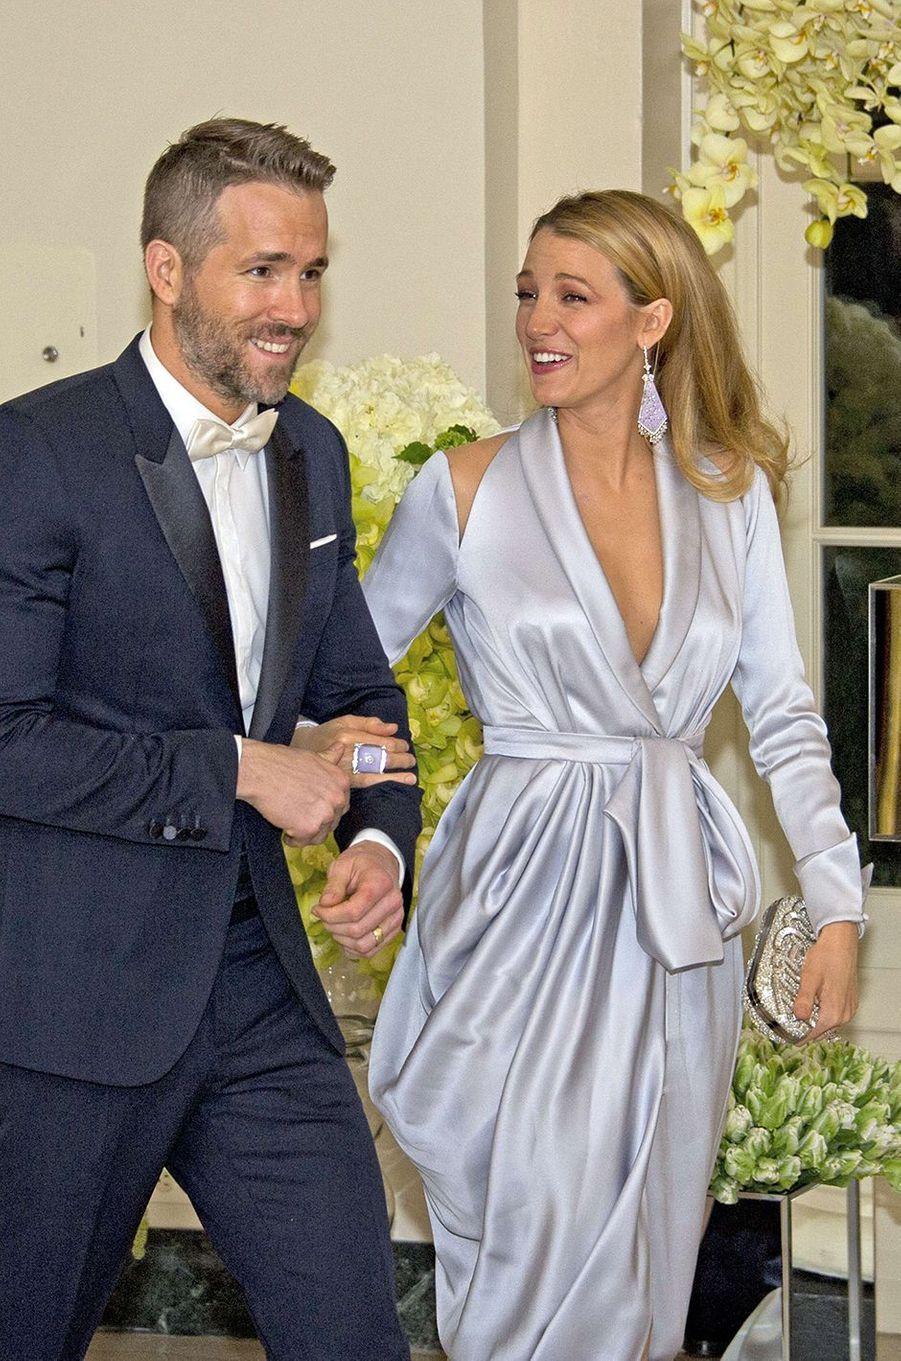 Blake Lively et Ryan Reynolds attendent leur deuxième enfant.